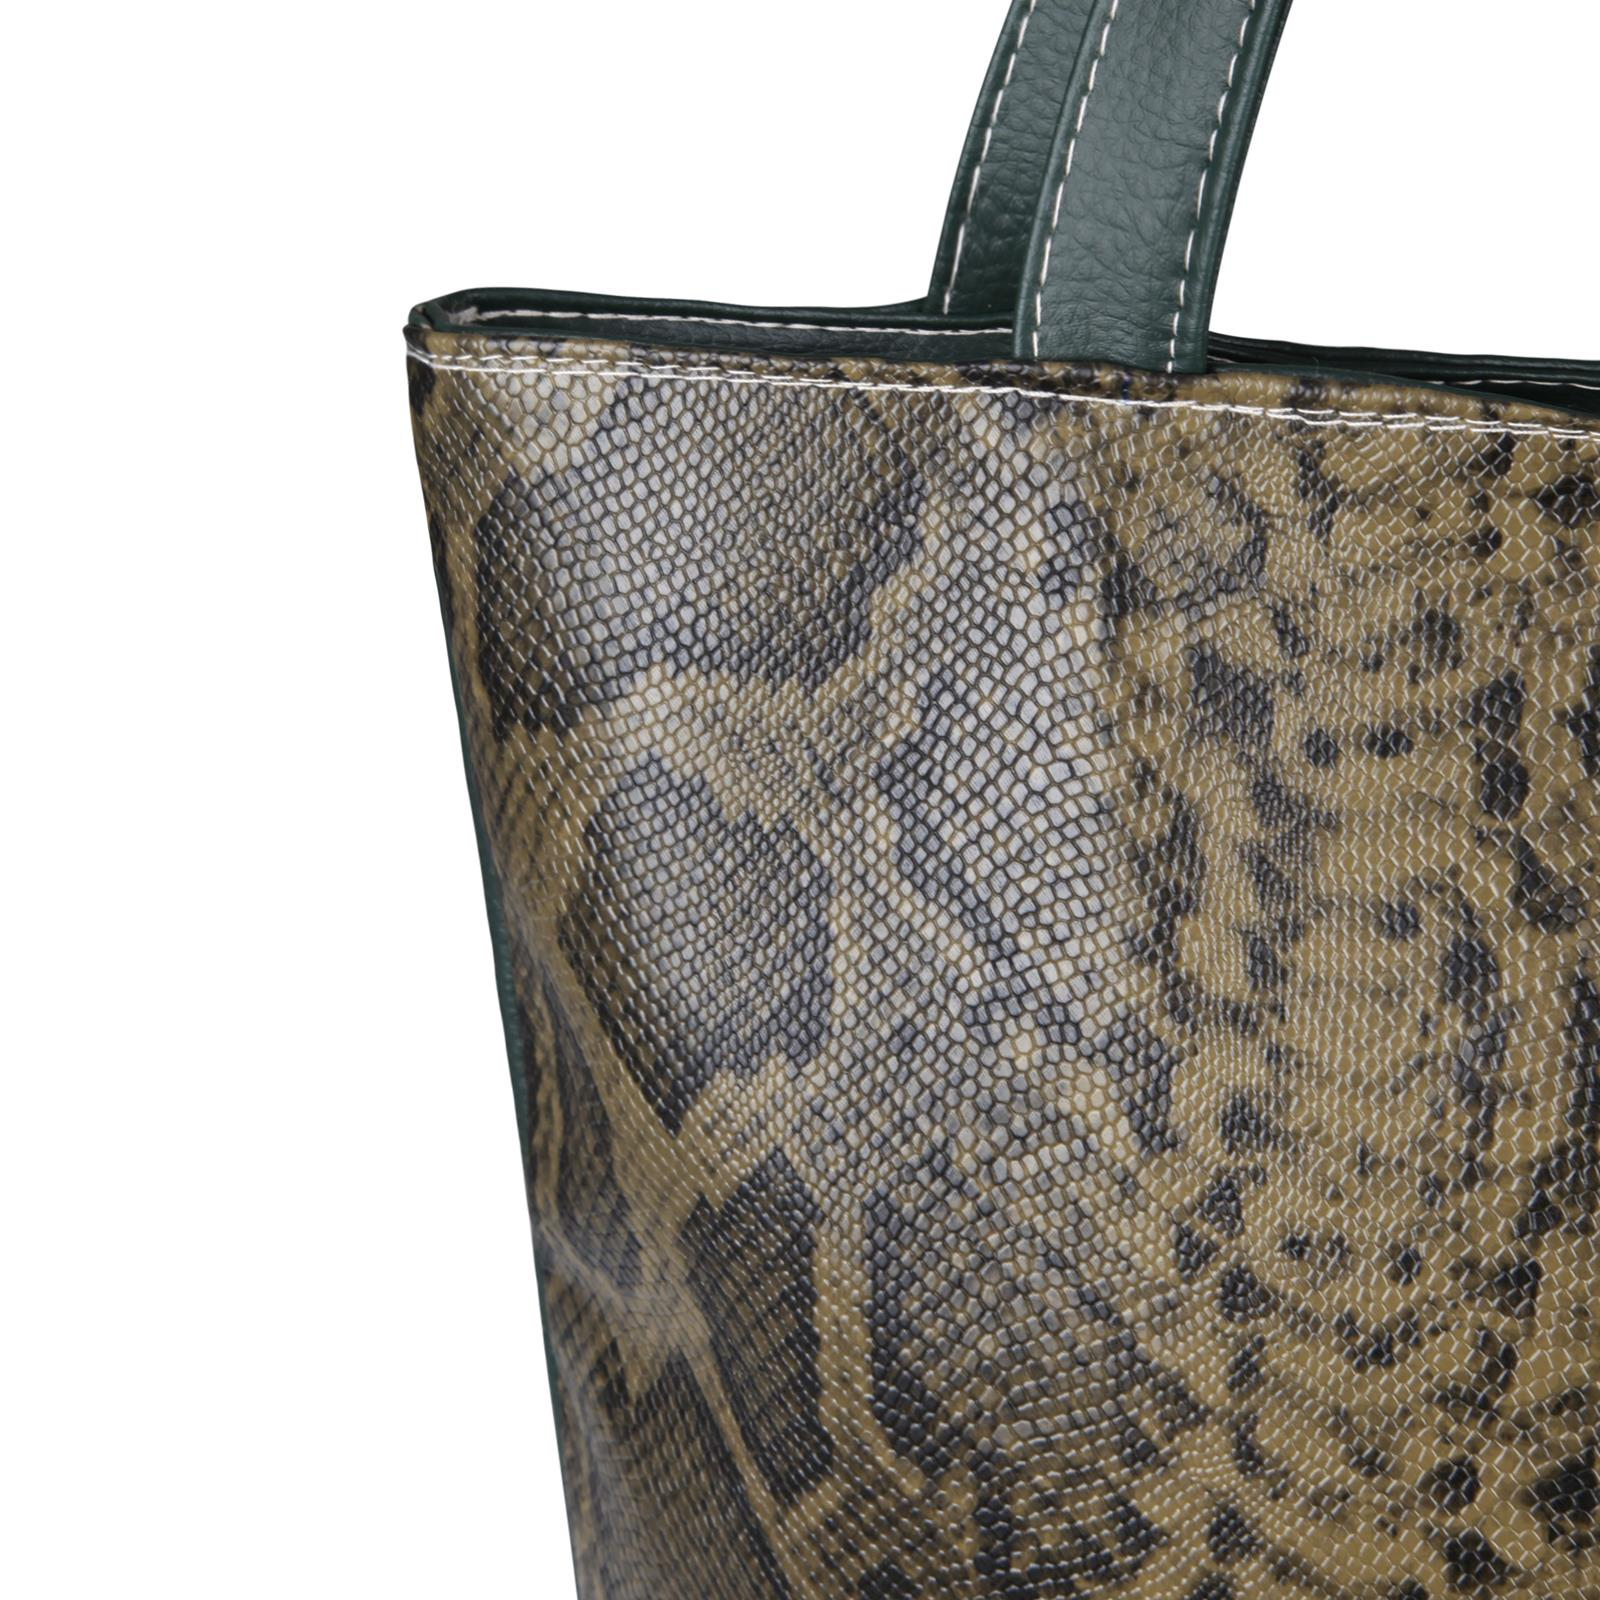 Animal-Print-Handbag-PU-Leather-Shoulder-Bag-Work-Office-Tote-Shopper-Fashion thumbnail 9